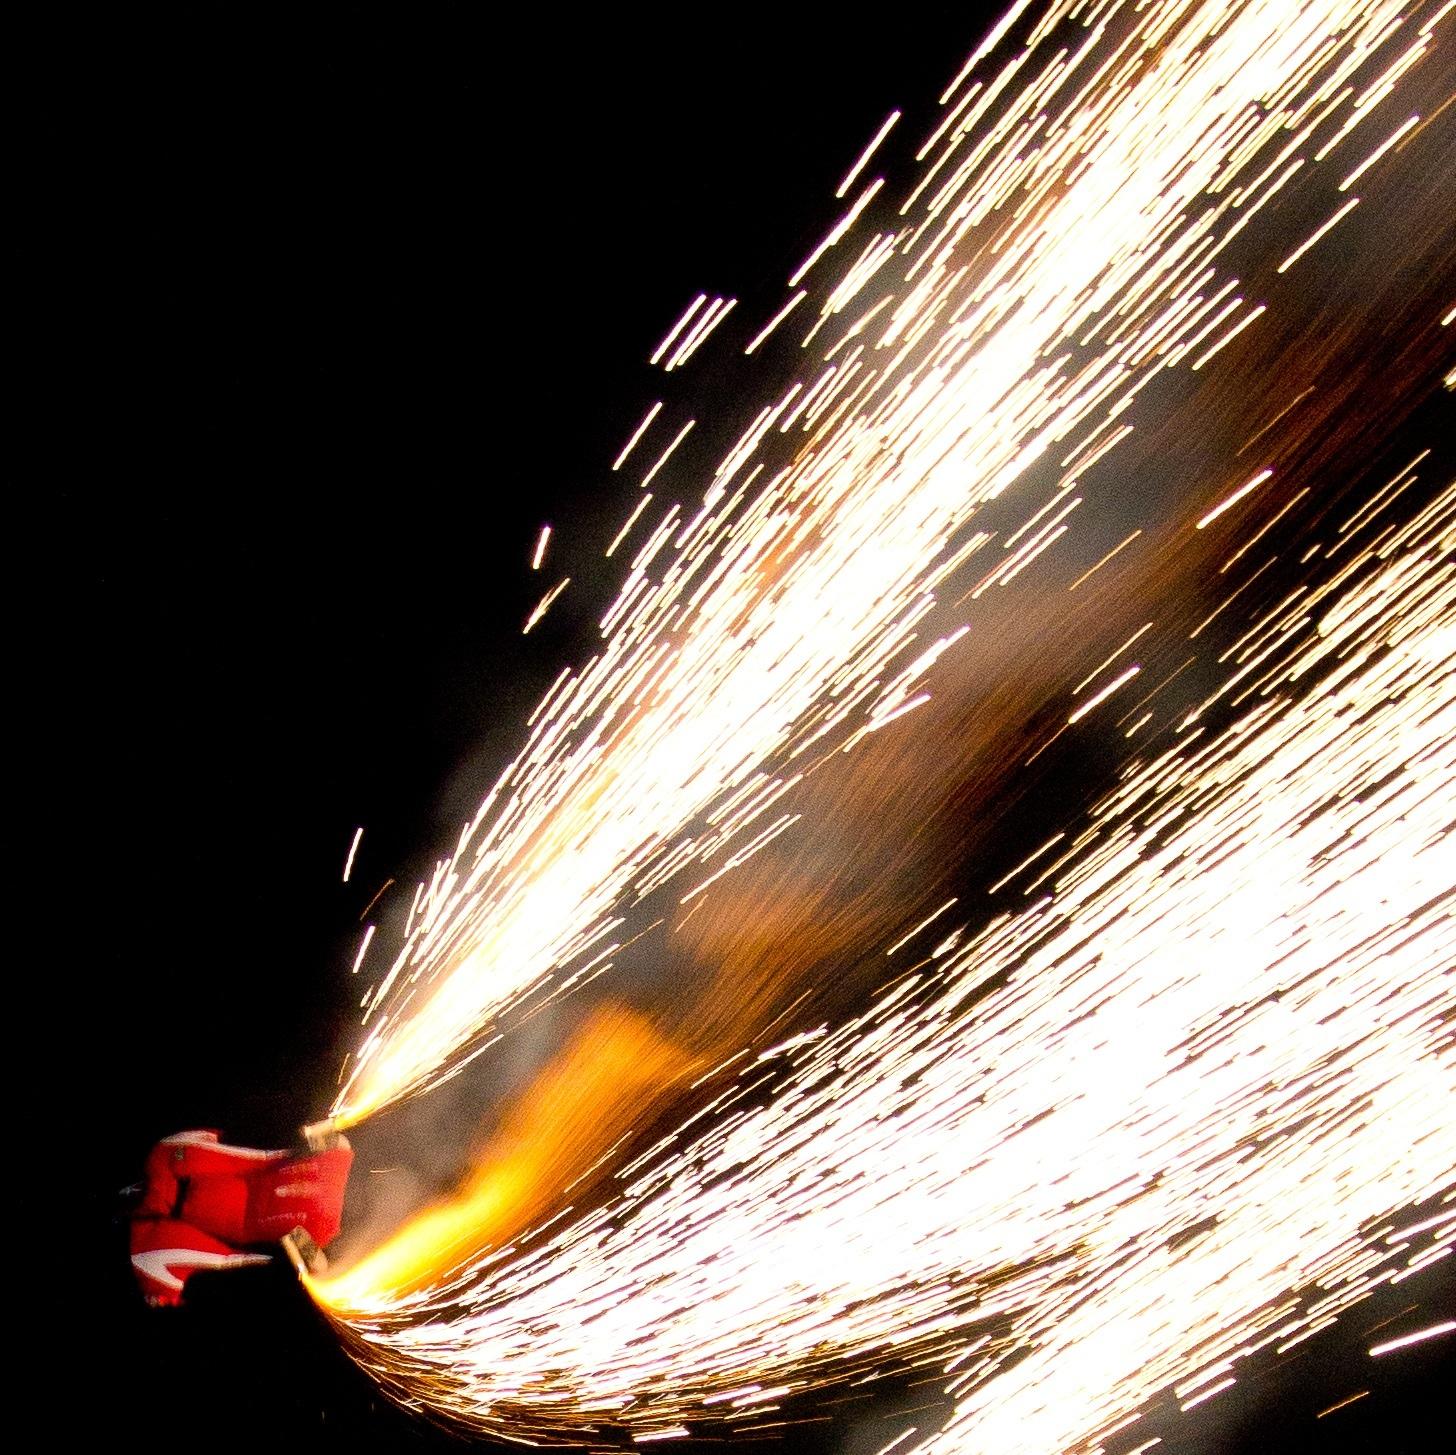 Night, fire, wingsuit jump